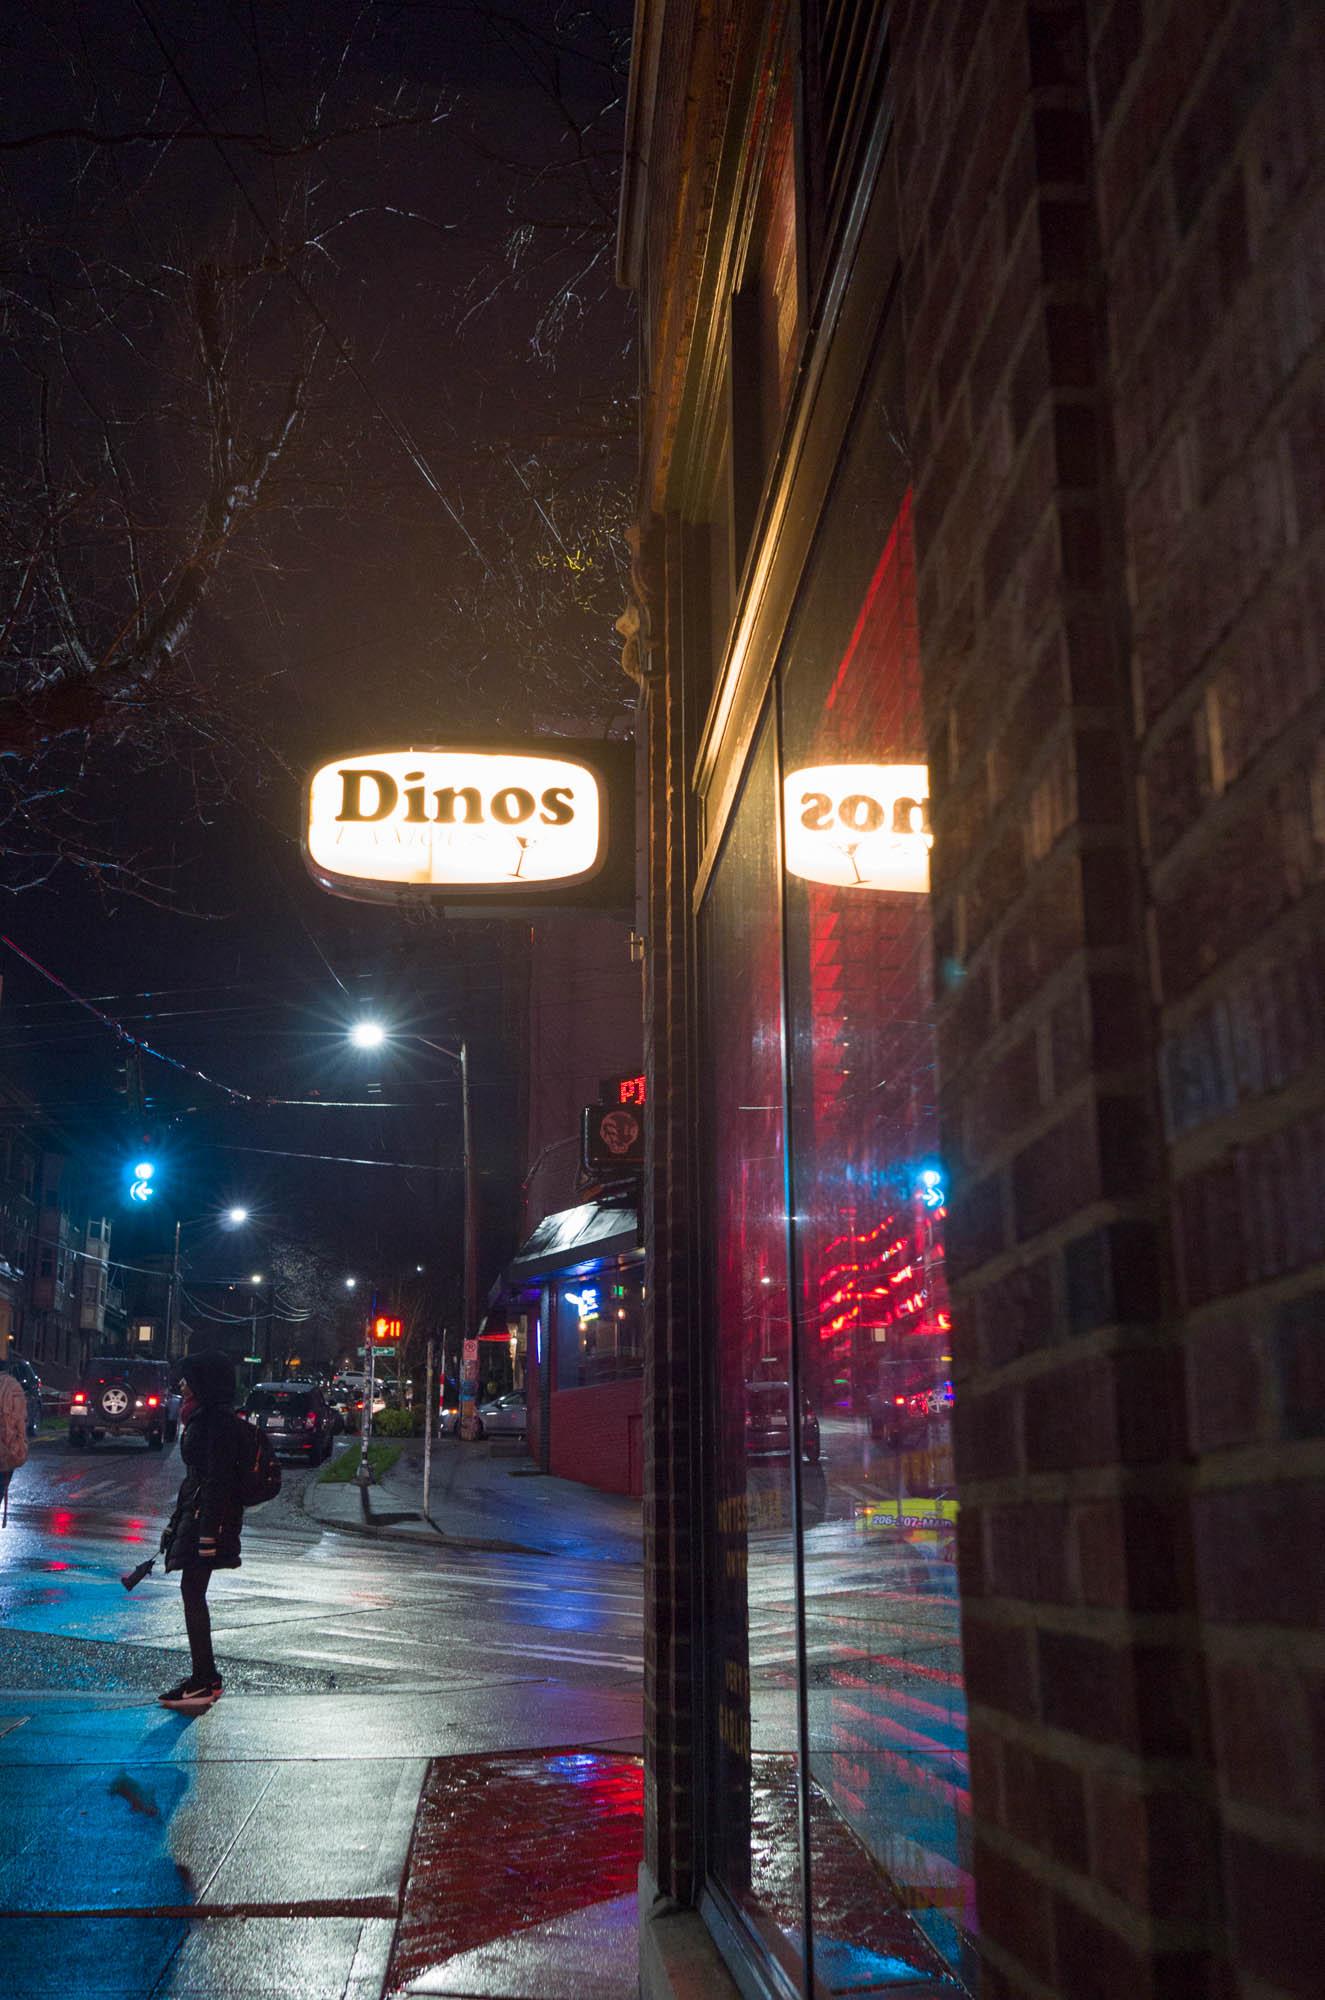 Dinos (night streetscape)